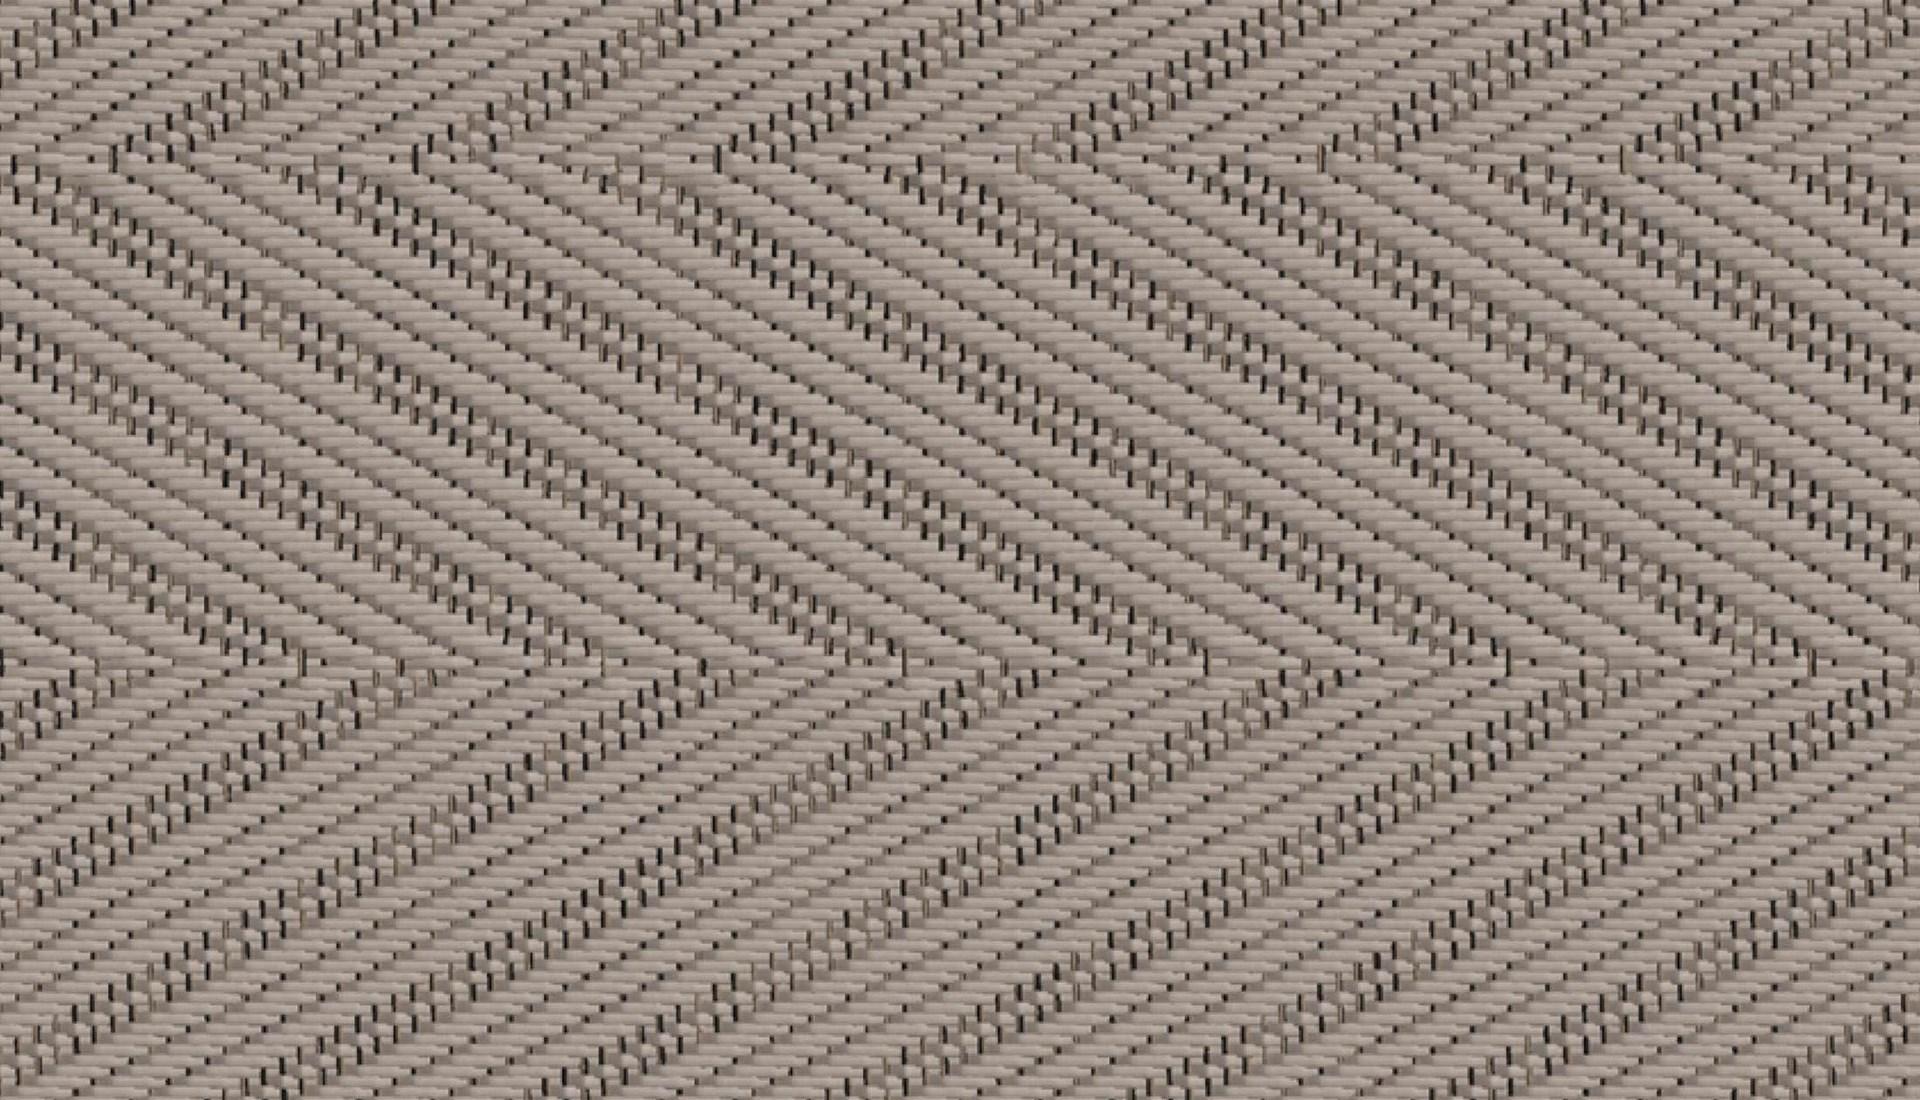 Graphic Herringbonebeige2 2x